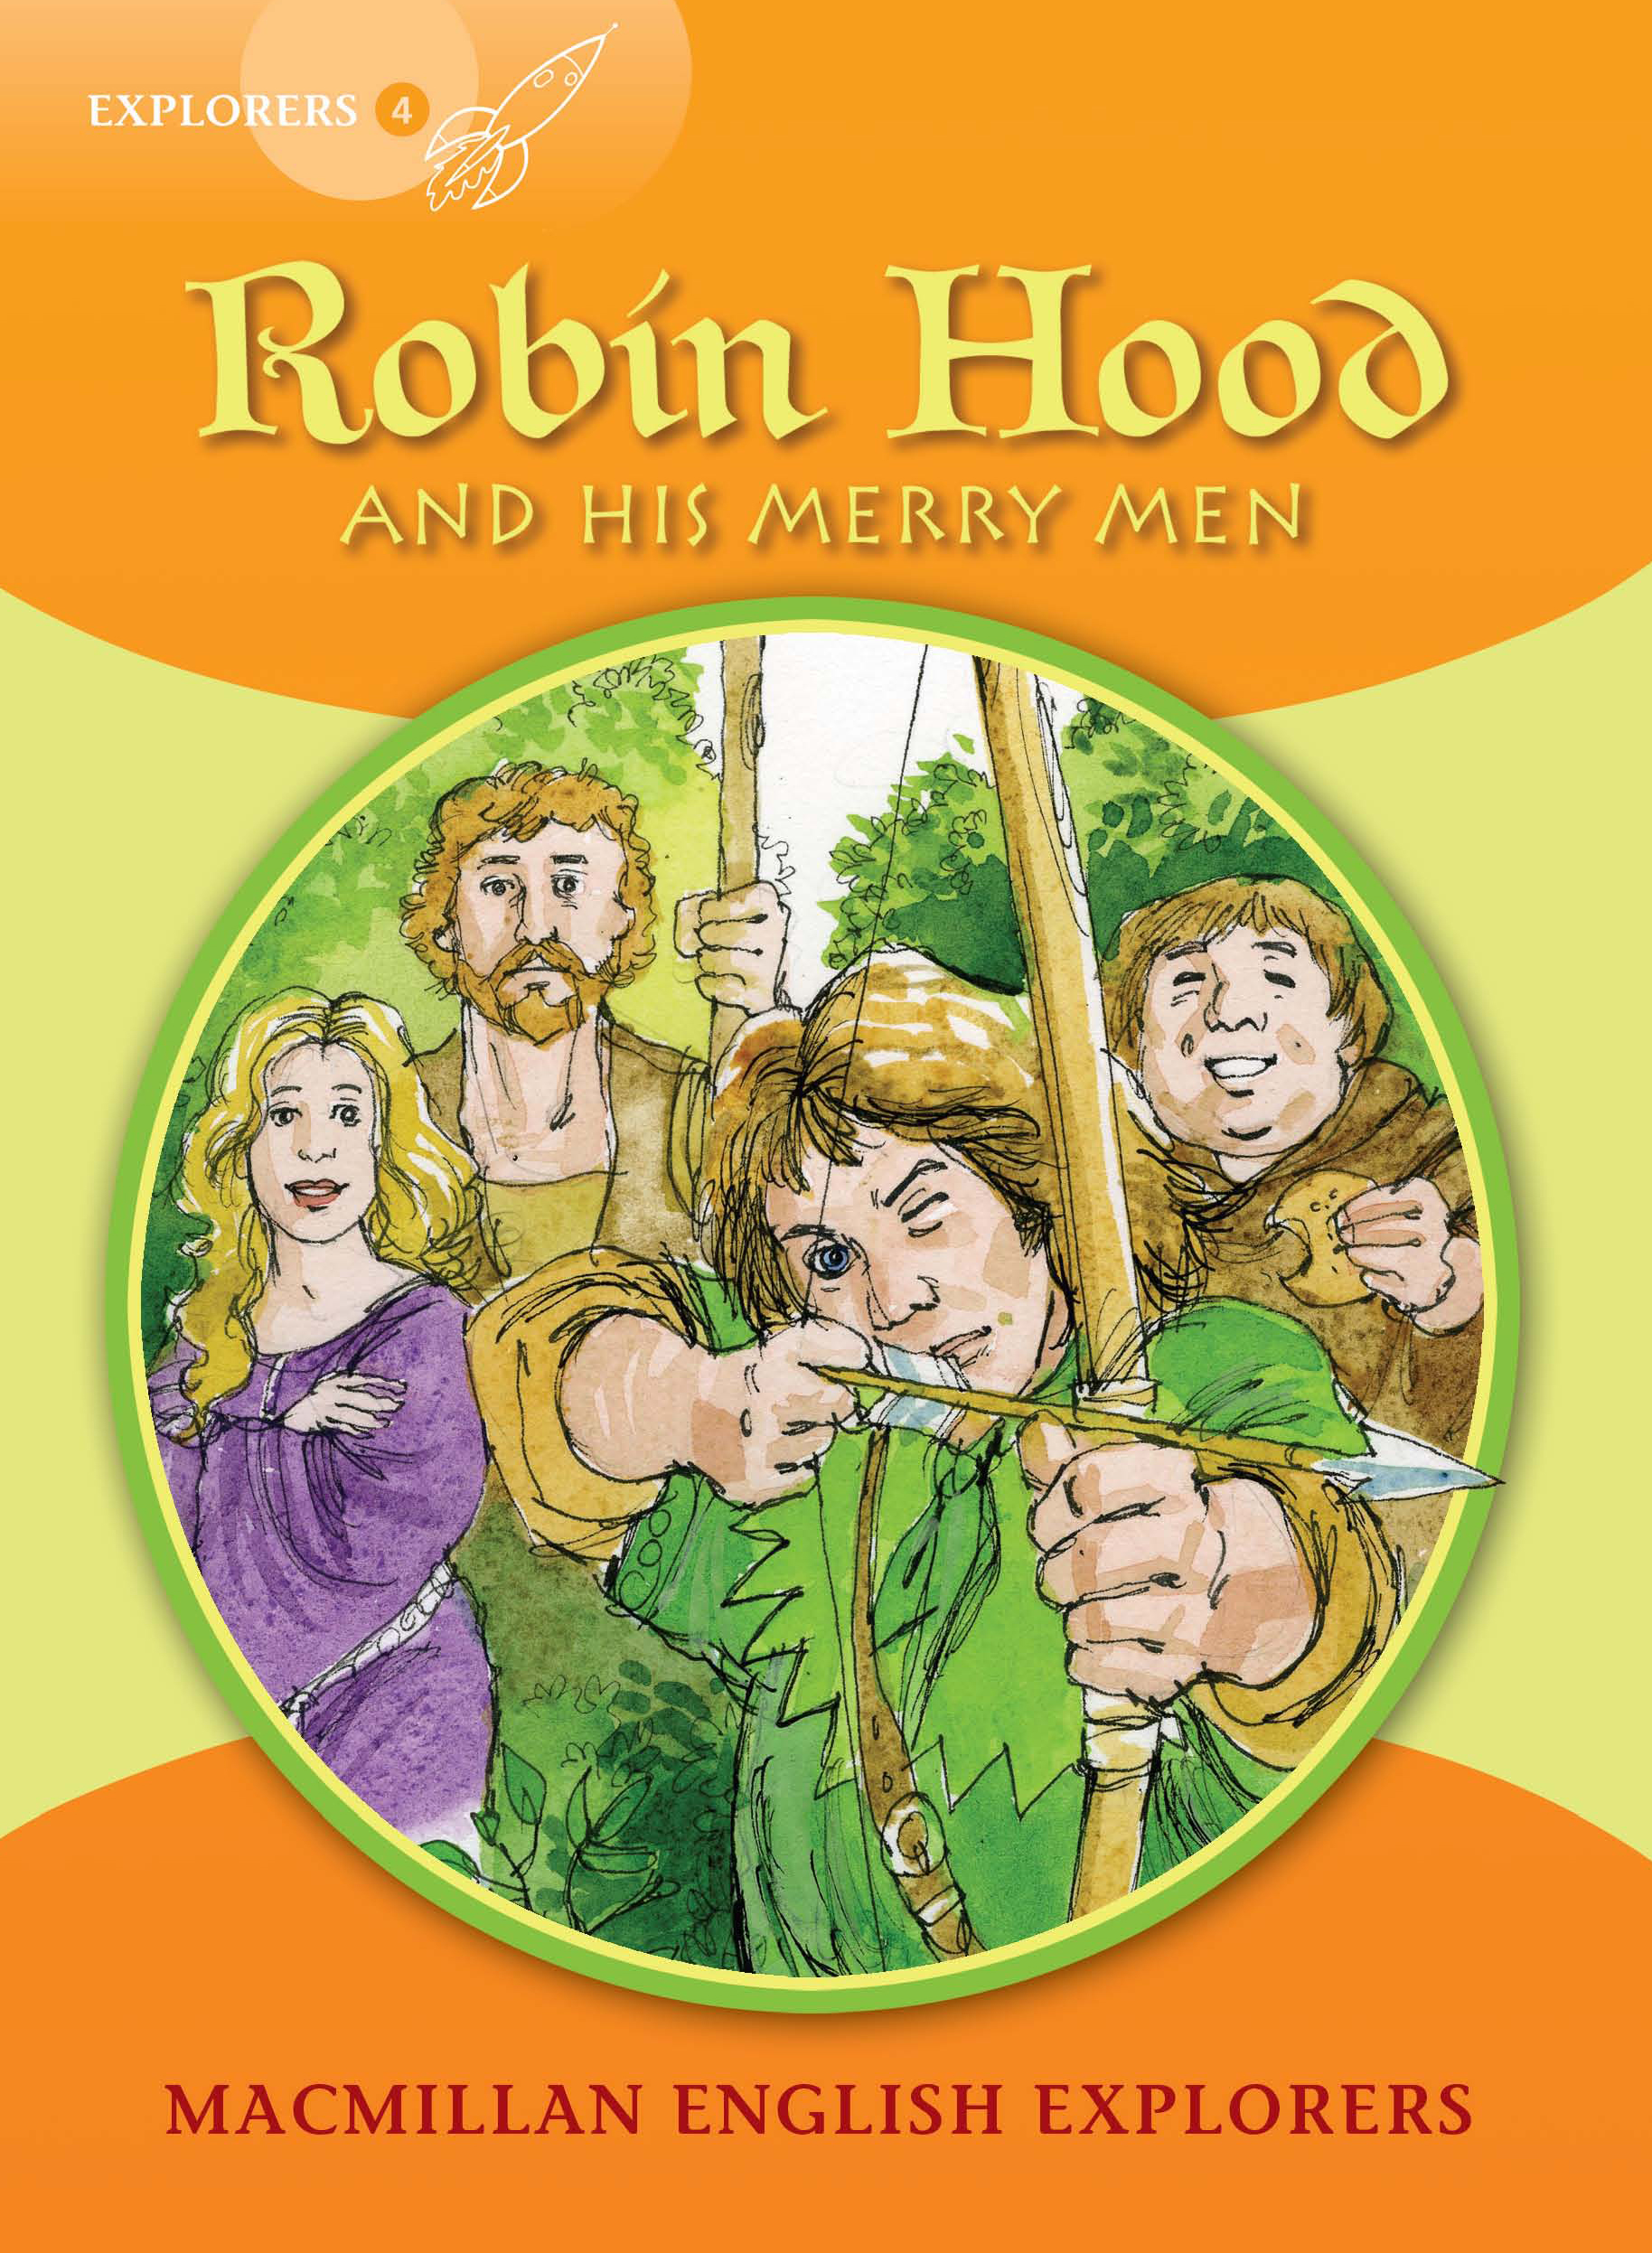 Explorers 4: Robin Hood and his Merry Men